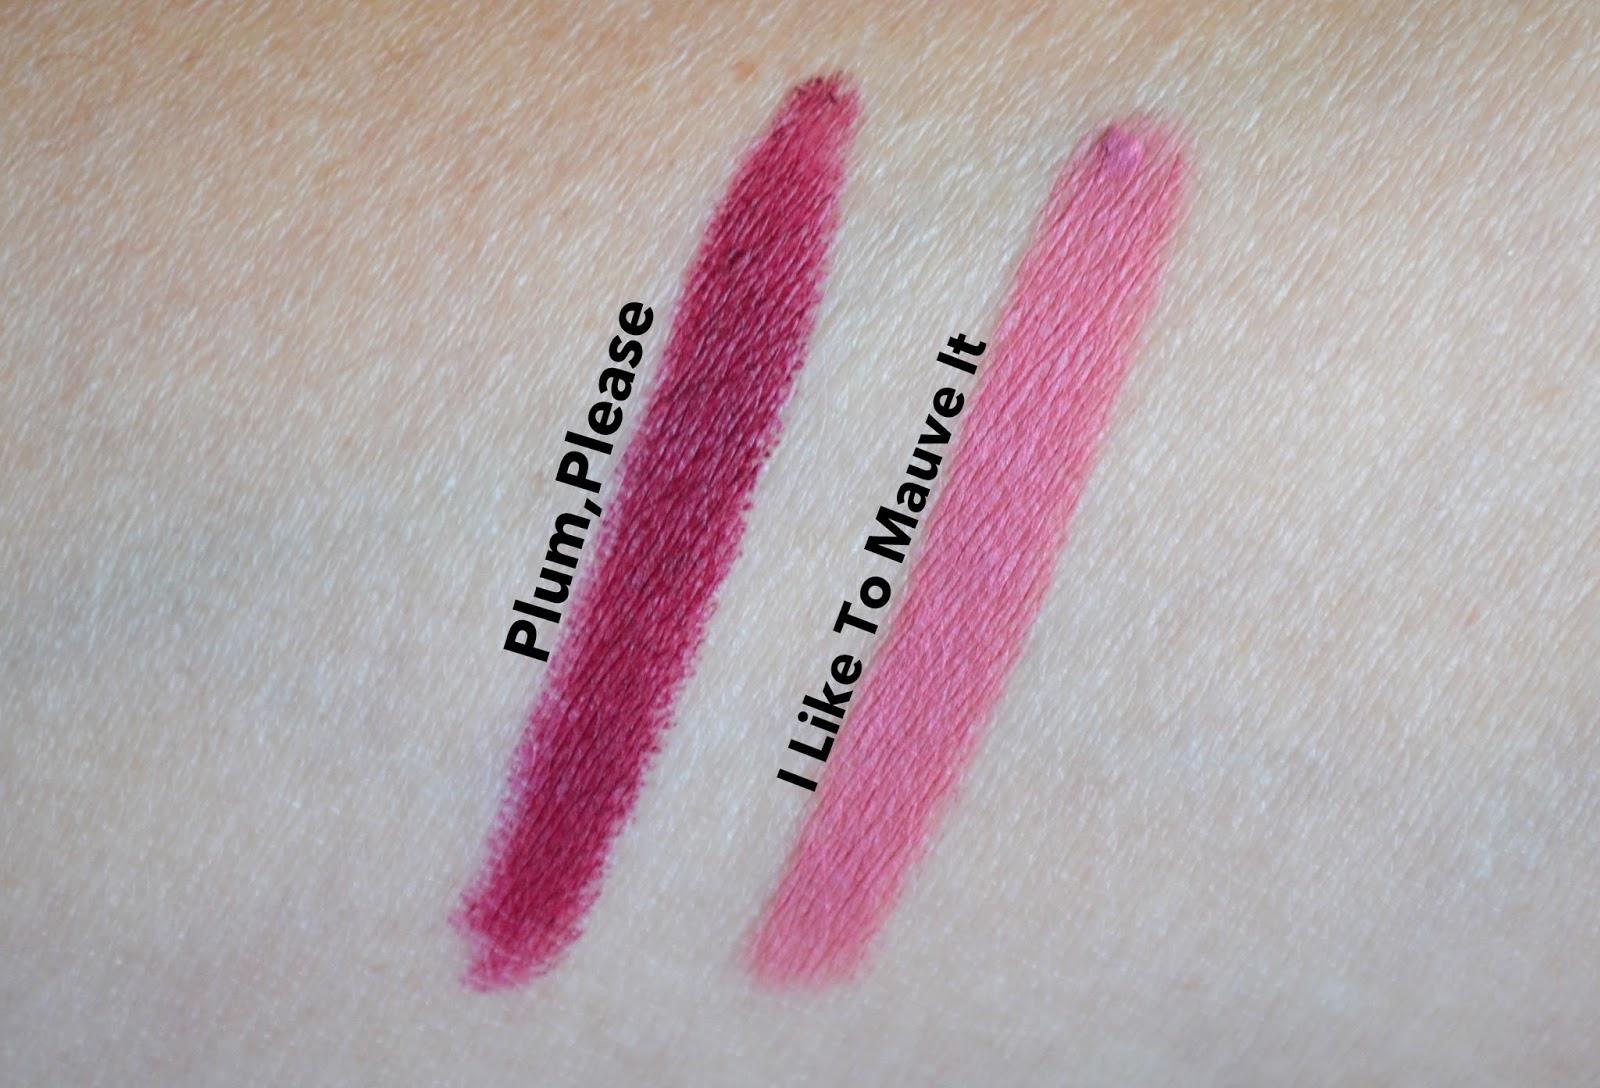 Lip Studio Color Contour Lip Palette by Maybelline #13